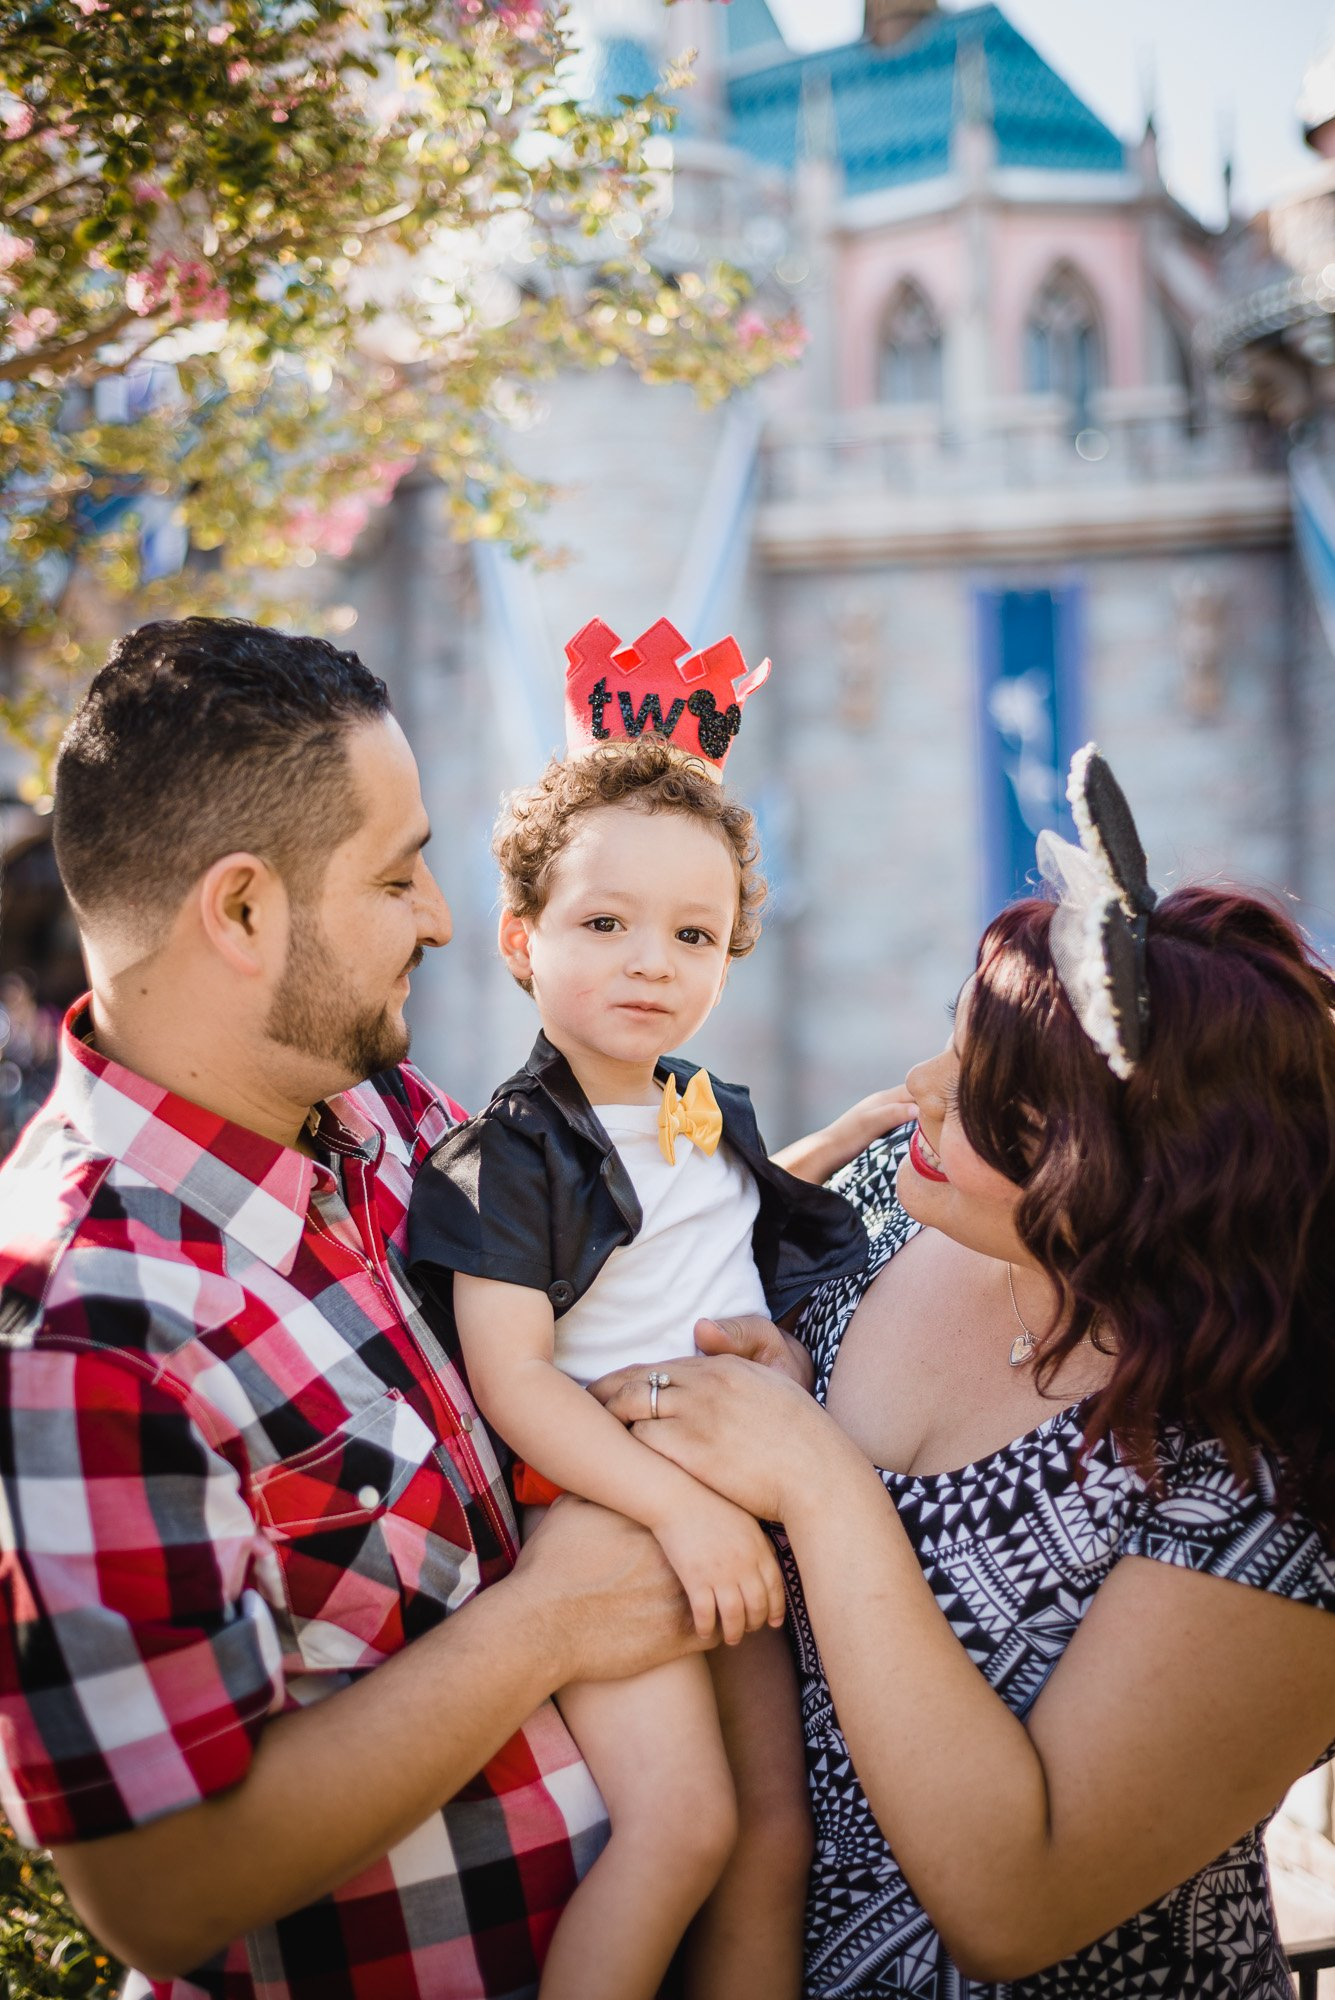 Diaz Family posing together at Disneyland